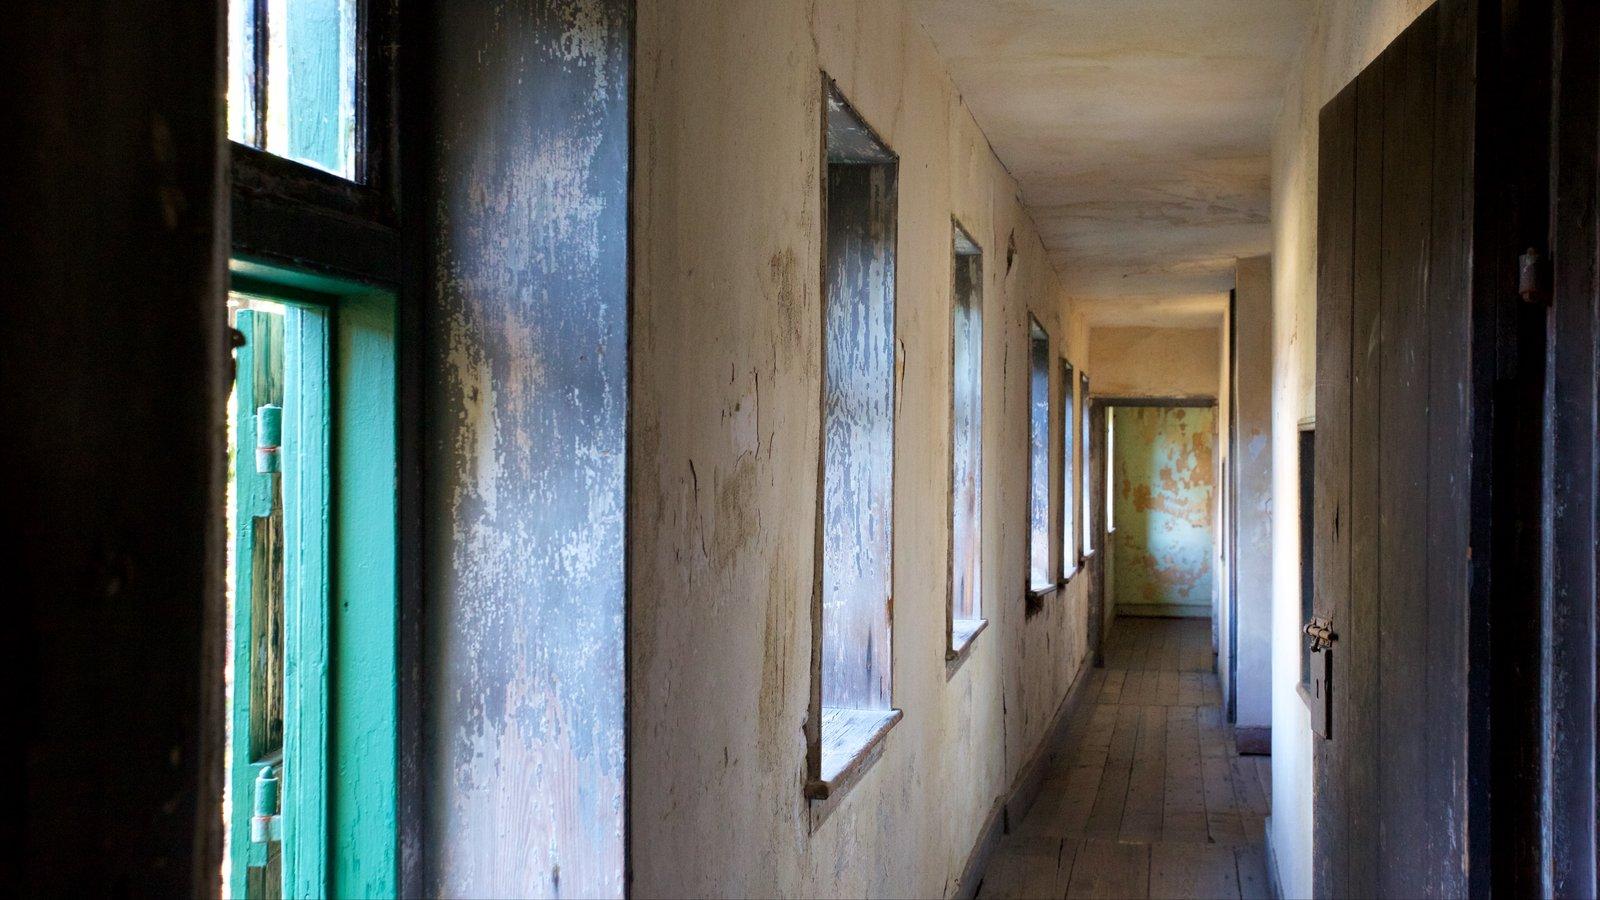 Aiken-Rhett House mostrando vistas internas e elementos de patrimônio